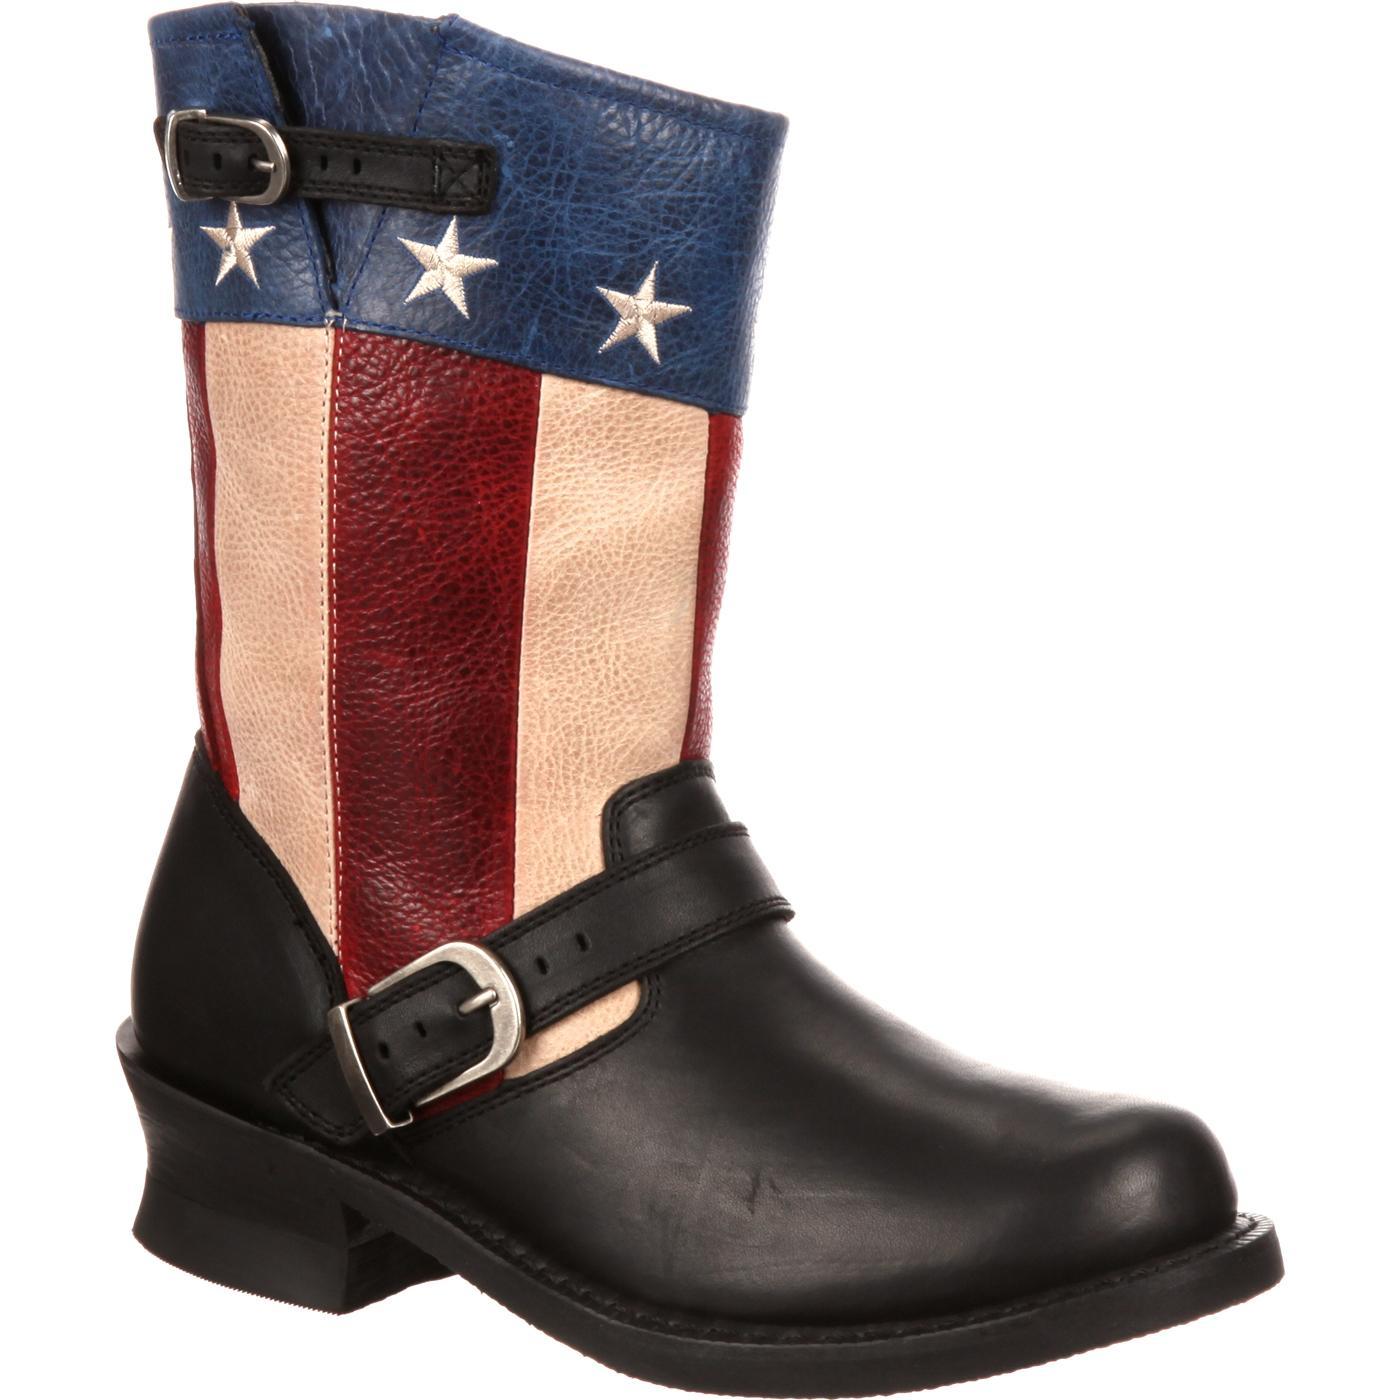 0b521d2663e Durango City Men's SoHo Patriotic Engineer Boot